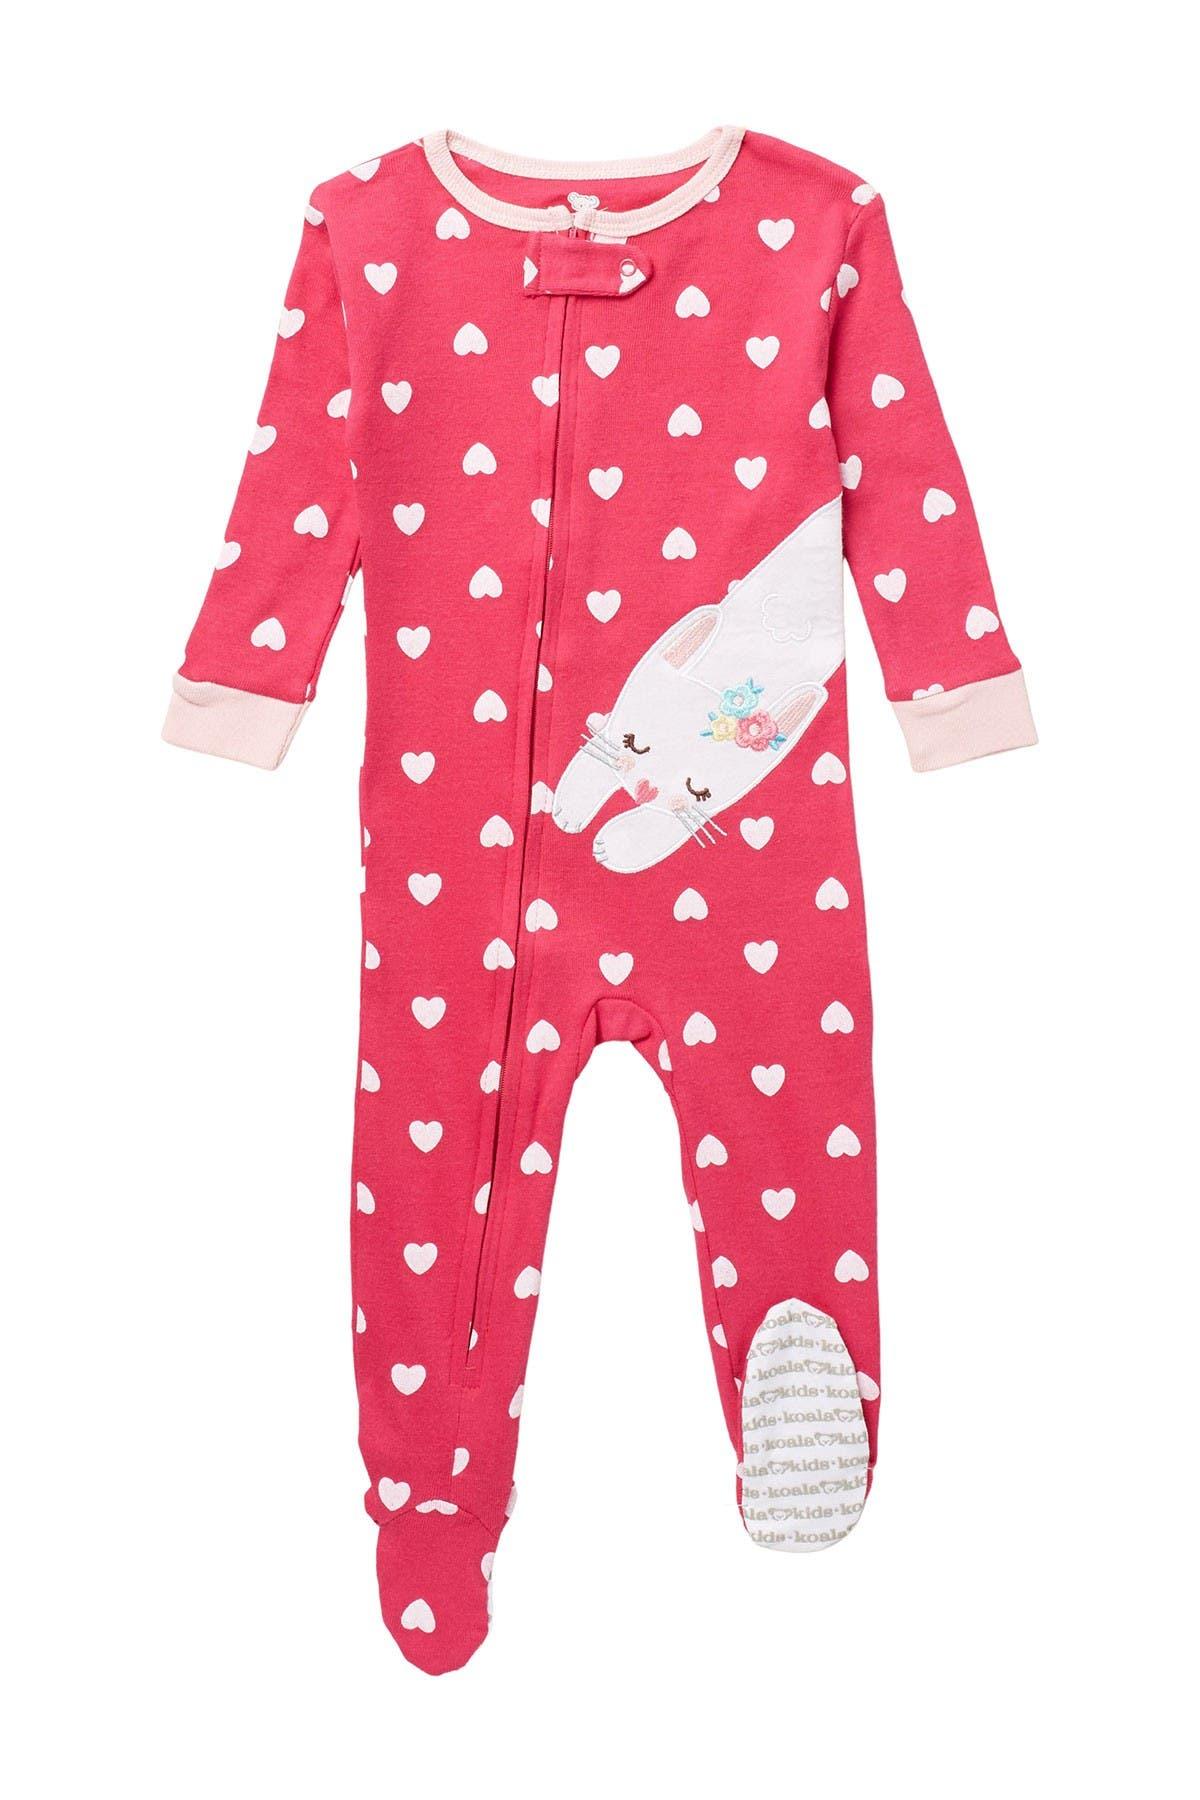 Image of koala baby Bunny Heart Print Footed Pajama